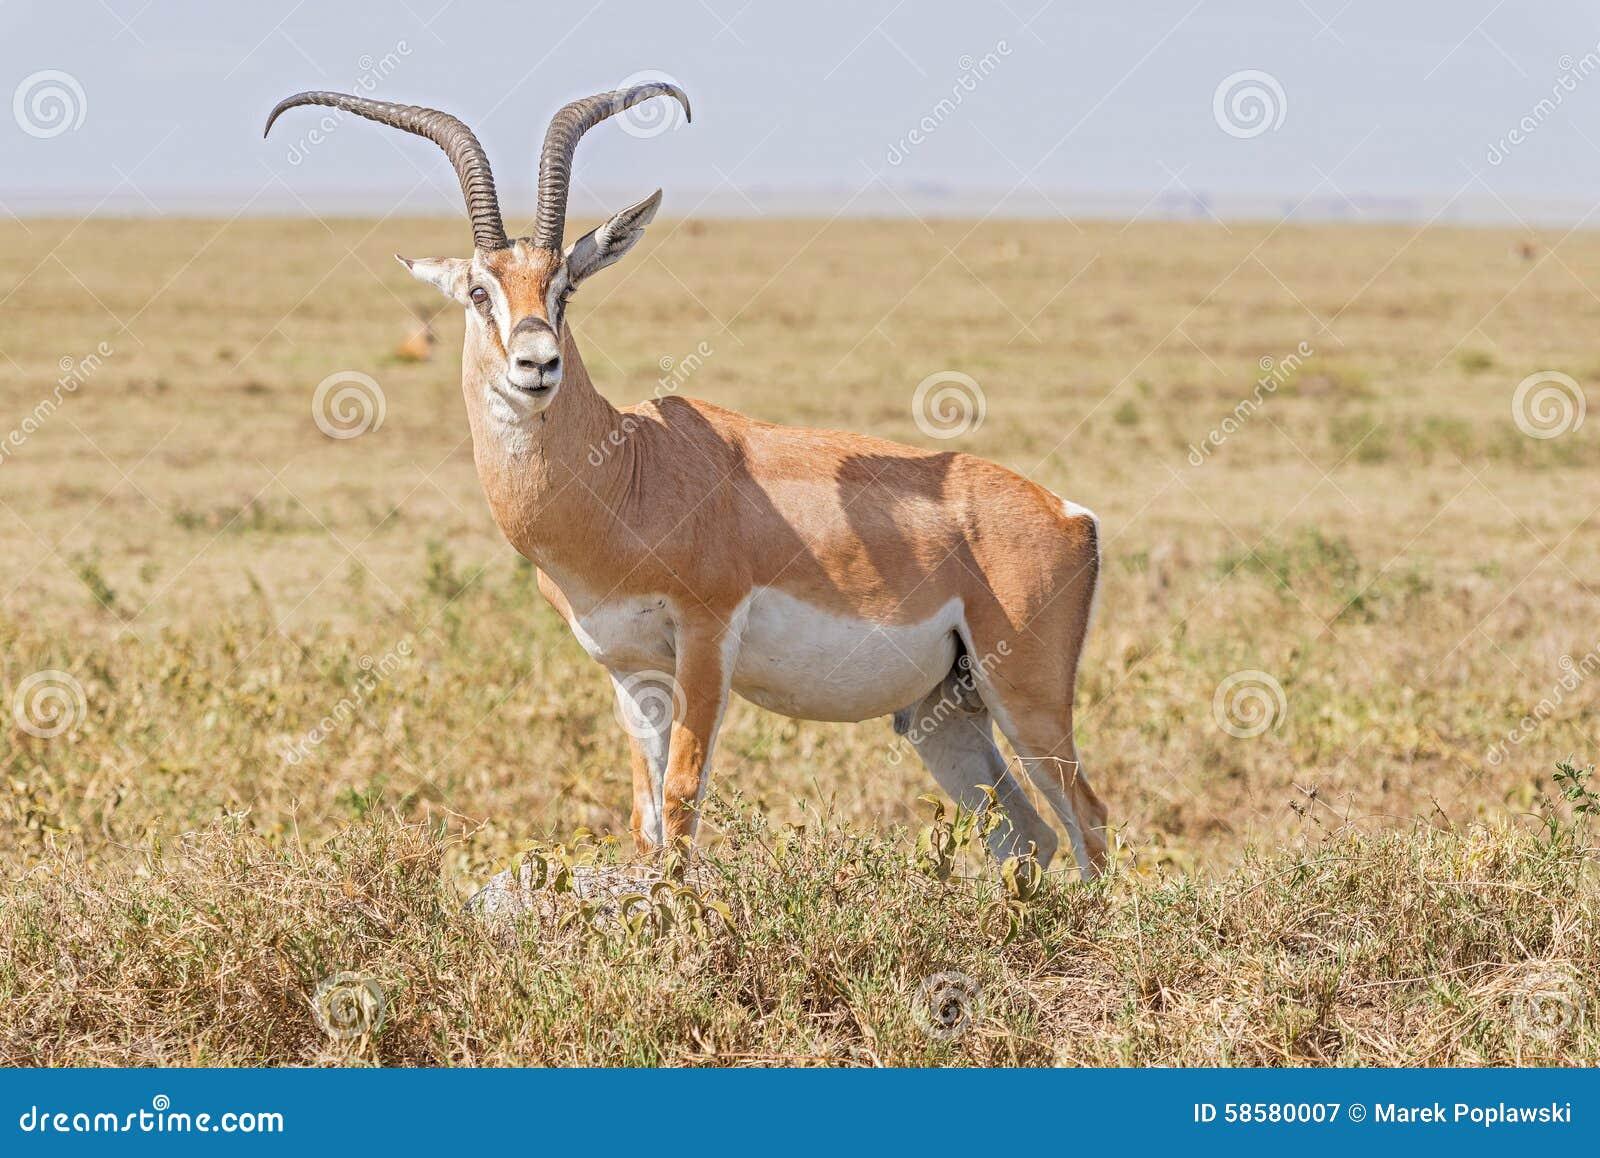 impala antelope in africa stock image image of antelope. Black Bedroom Furniture Sets. Home Design Ideas